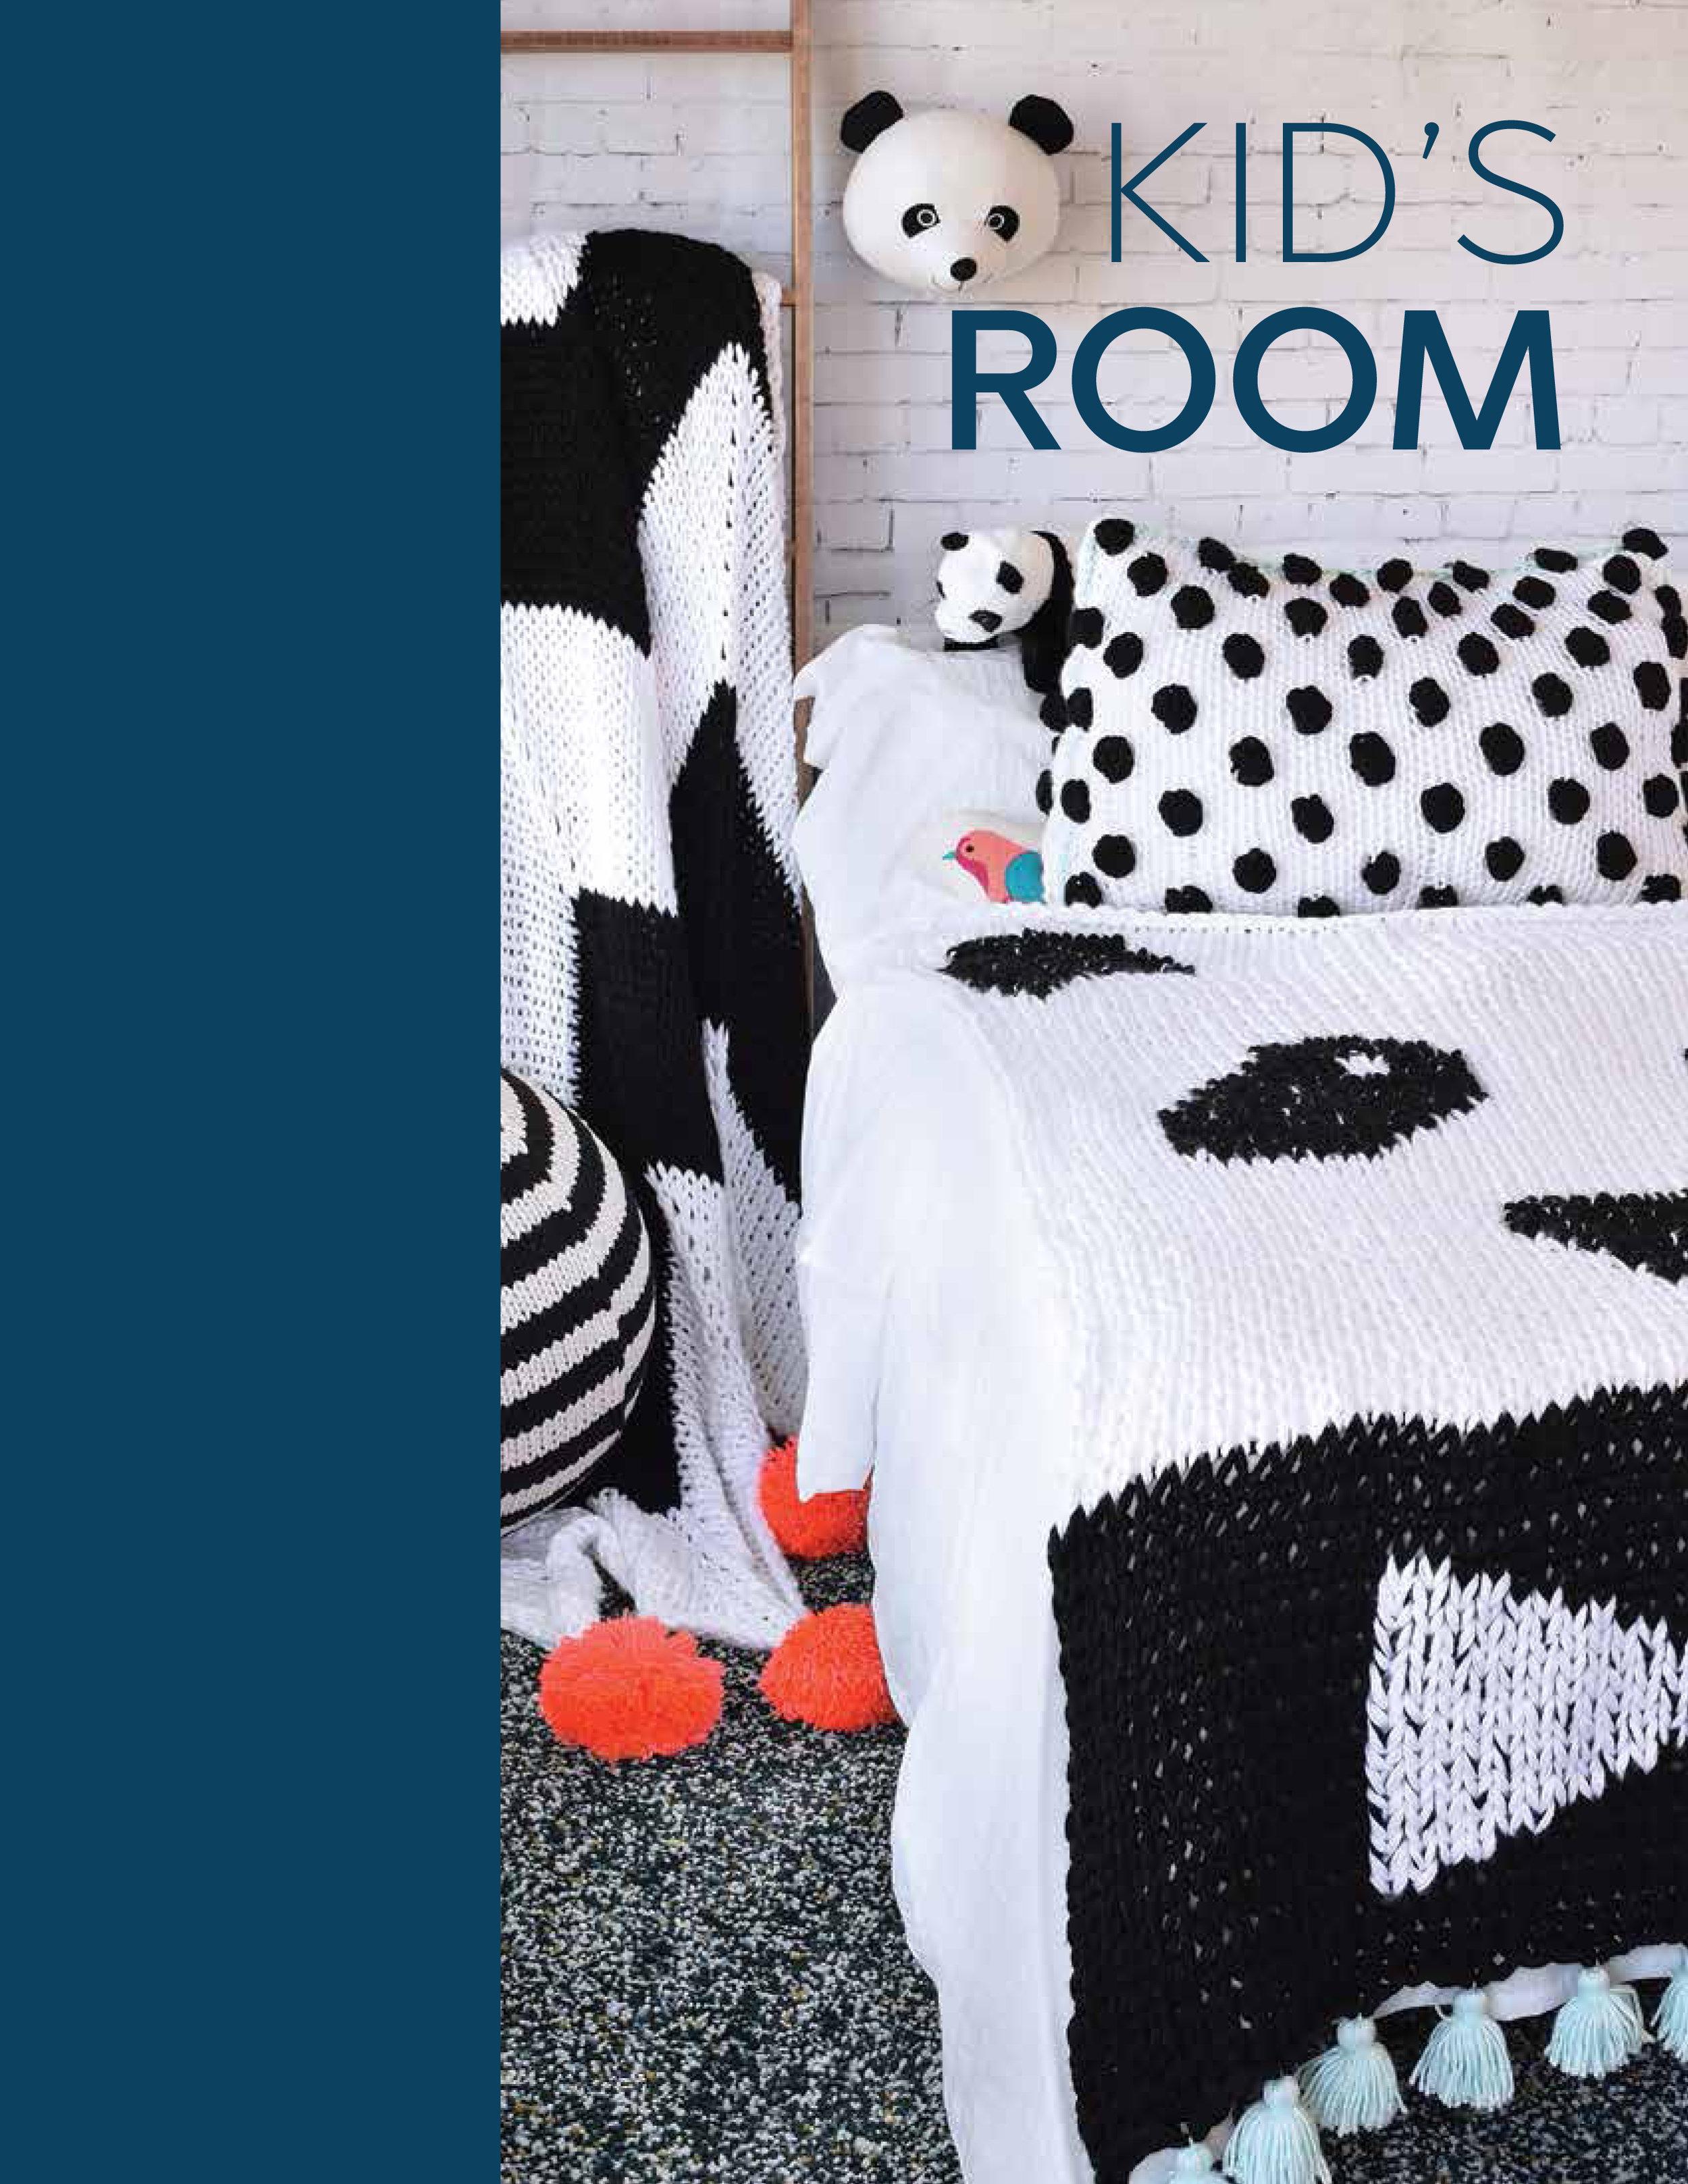 Kid's Room - Chevron BlanketPanda Throw BlanketDouble Stuffed Polka Dot PillowcaseStripy Ball Cover